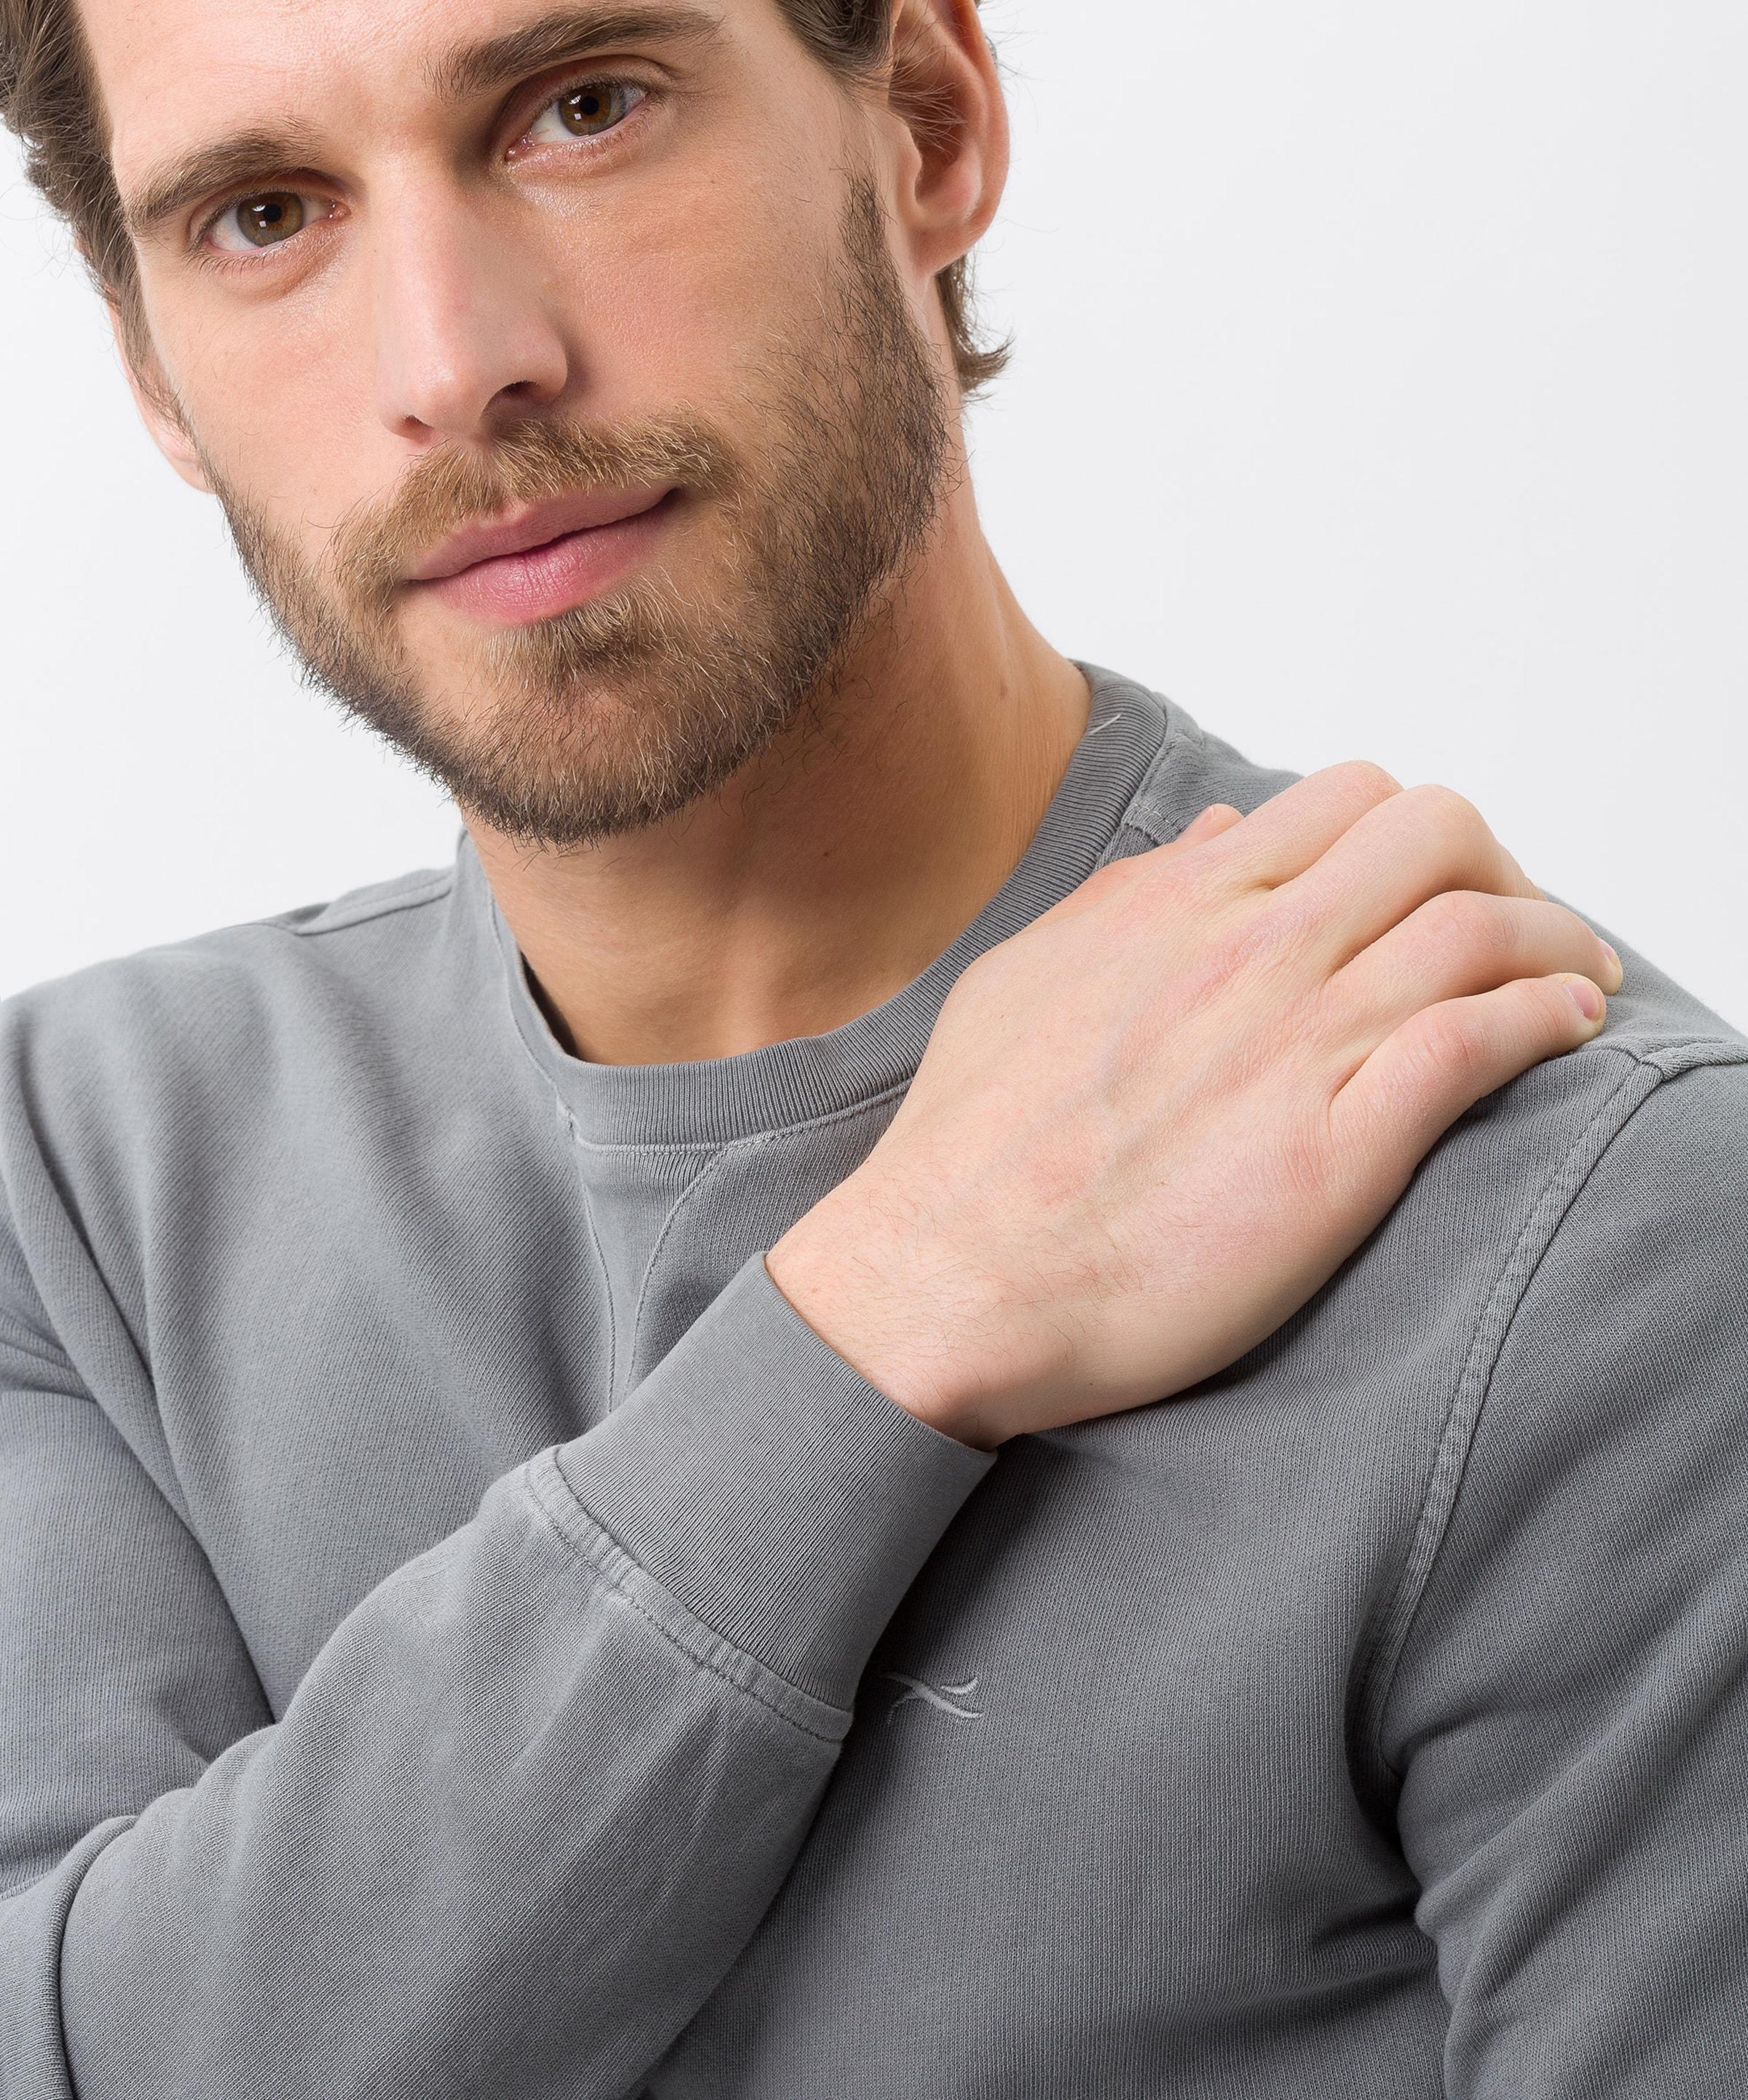 In Brax Sweatshirt Grau Grau Brax 'sawyer' Brax In Sweatshirt 'sawyer' Sweatshirt ZOTPuXwki